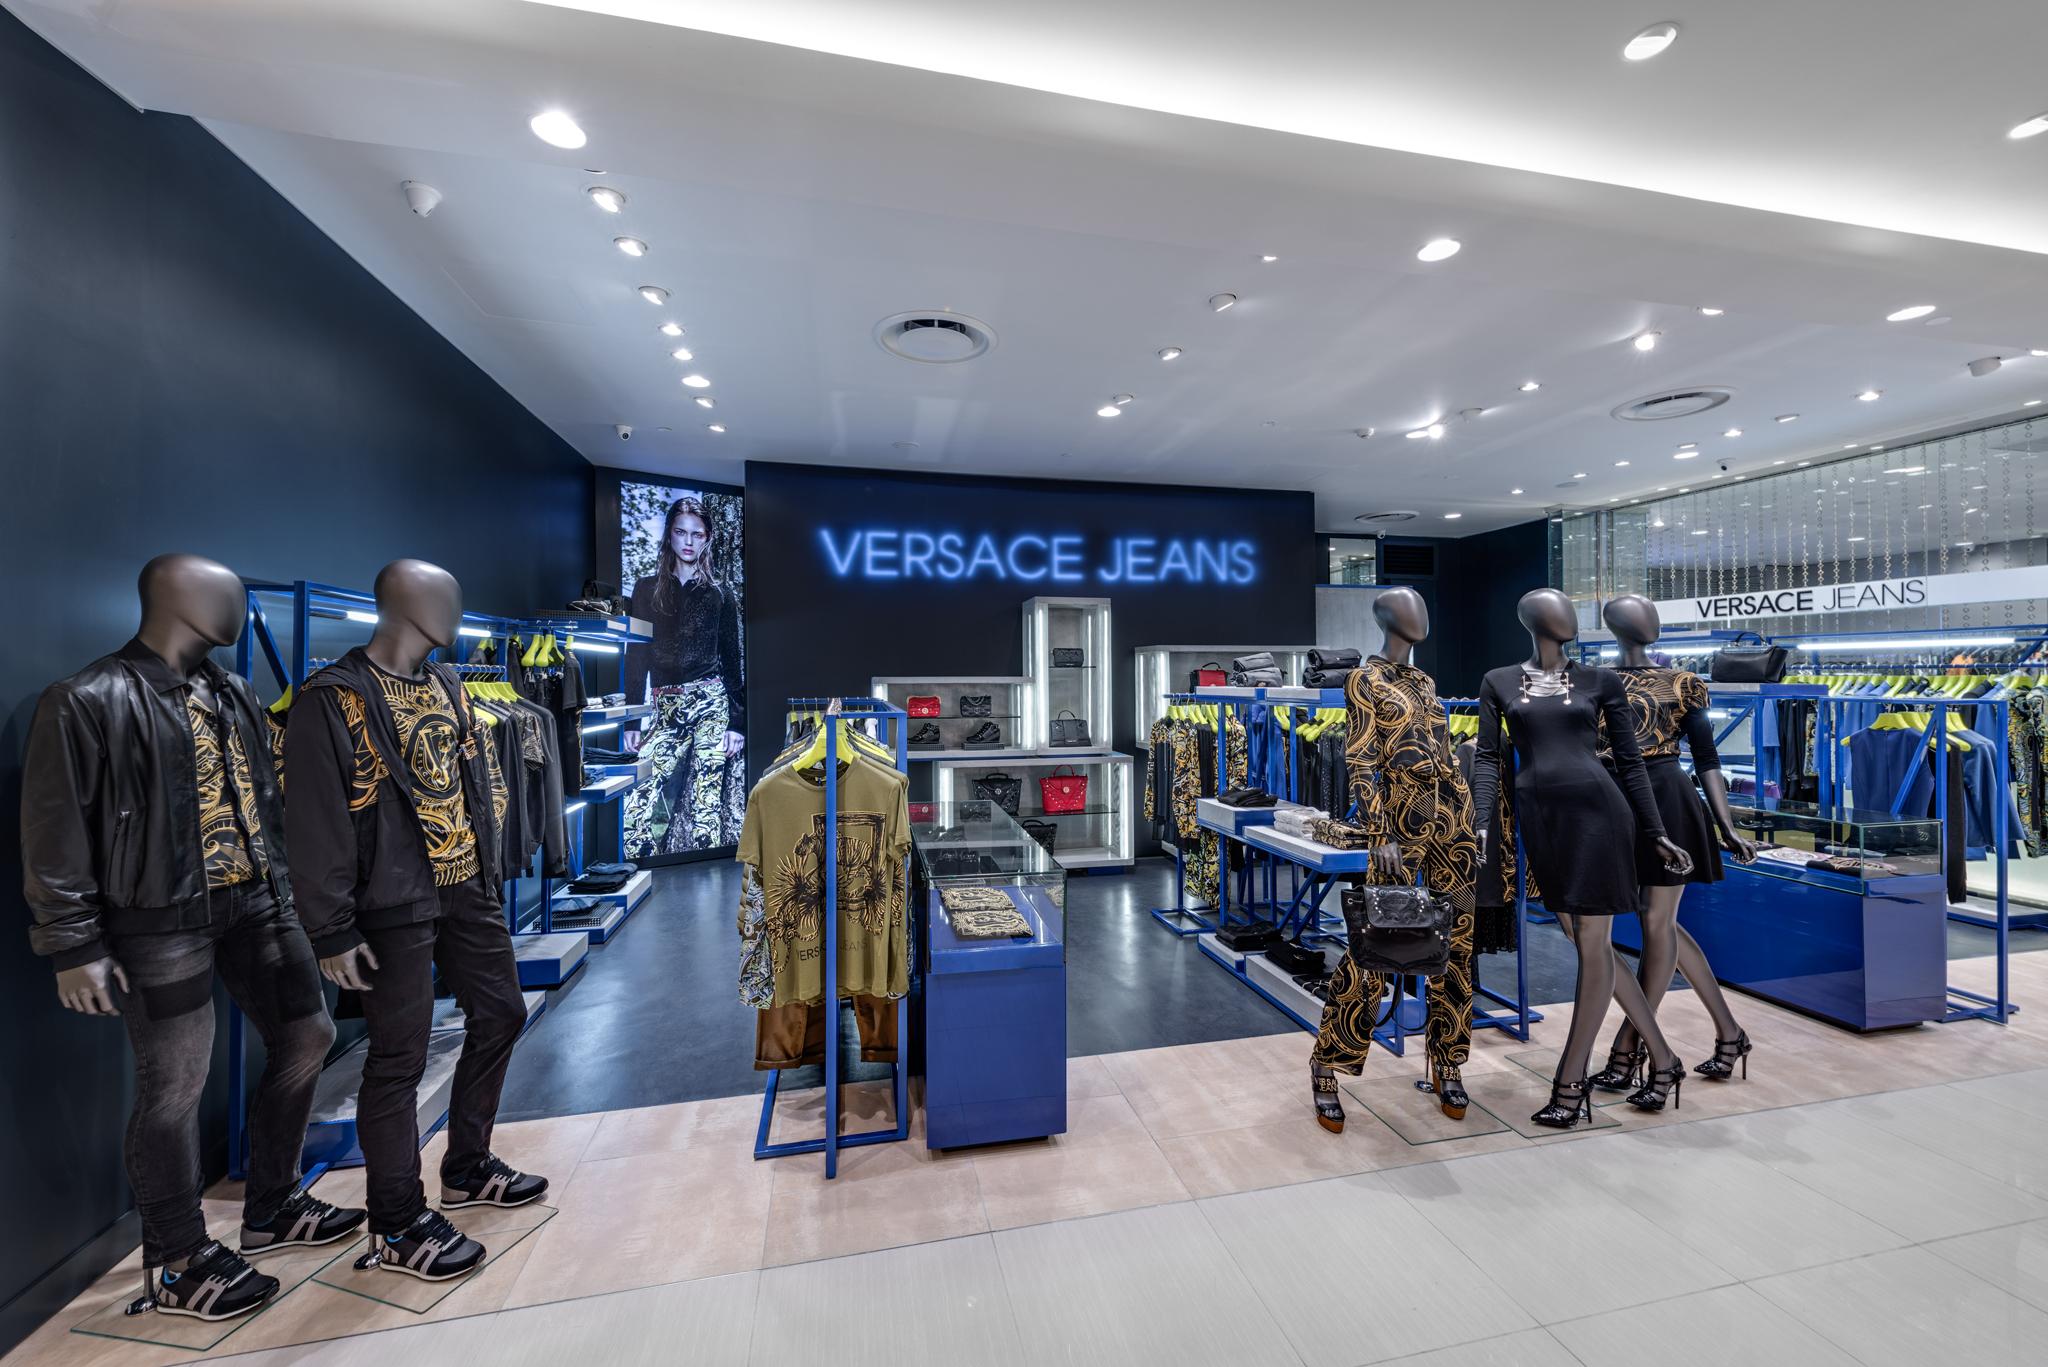 20160729 - Versace Jean - HCM - Commercial - Interior - Store - Retouch 0003.jpg